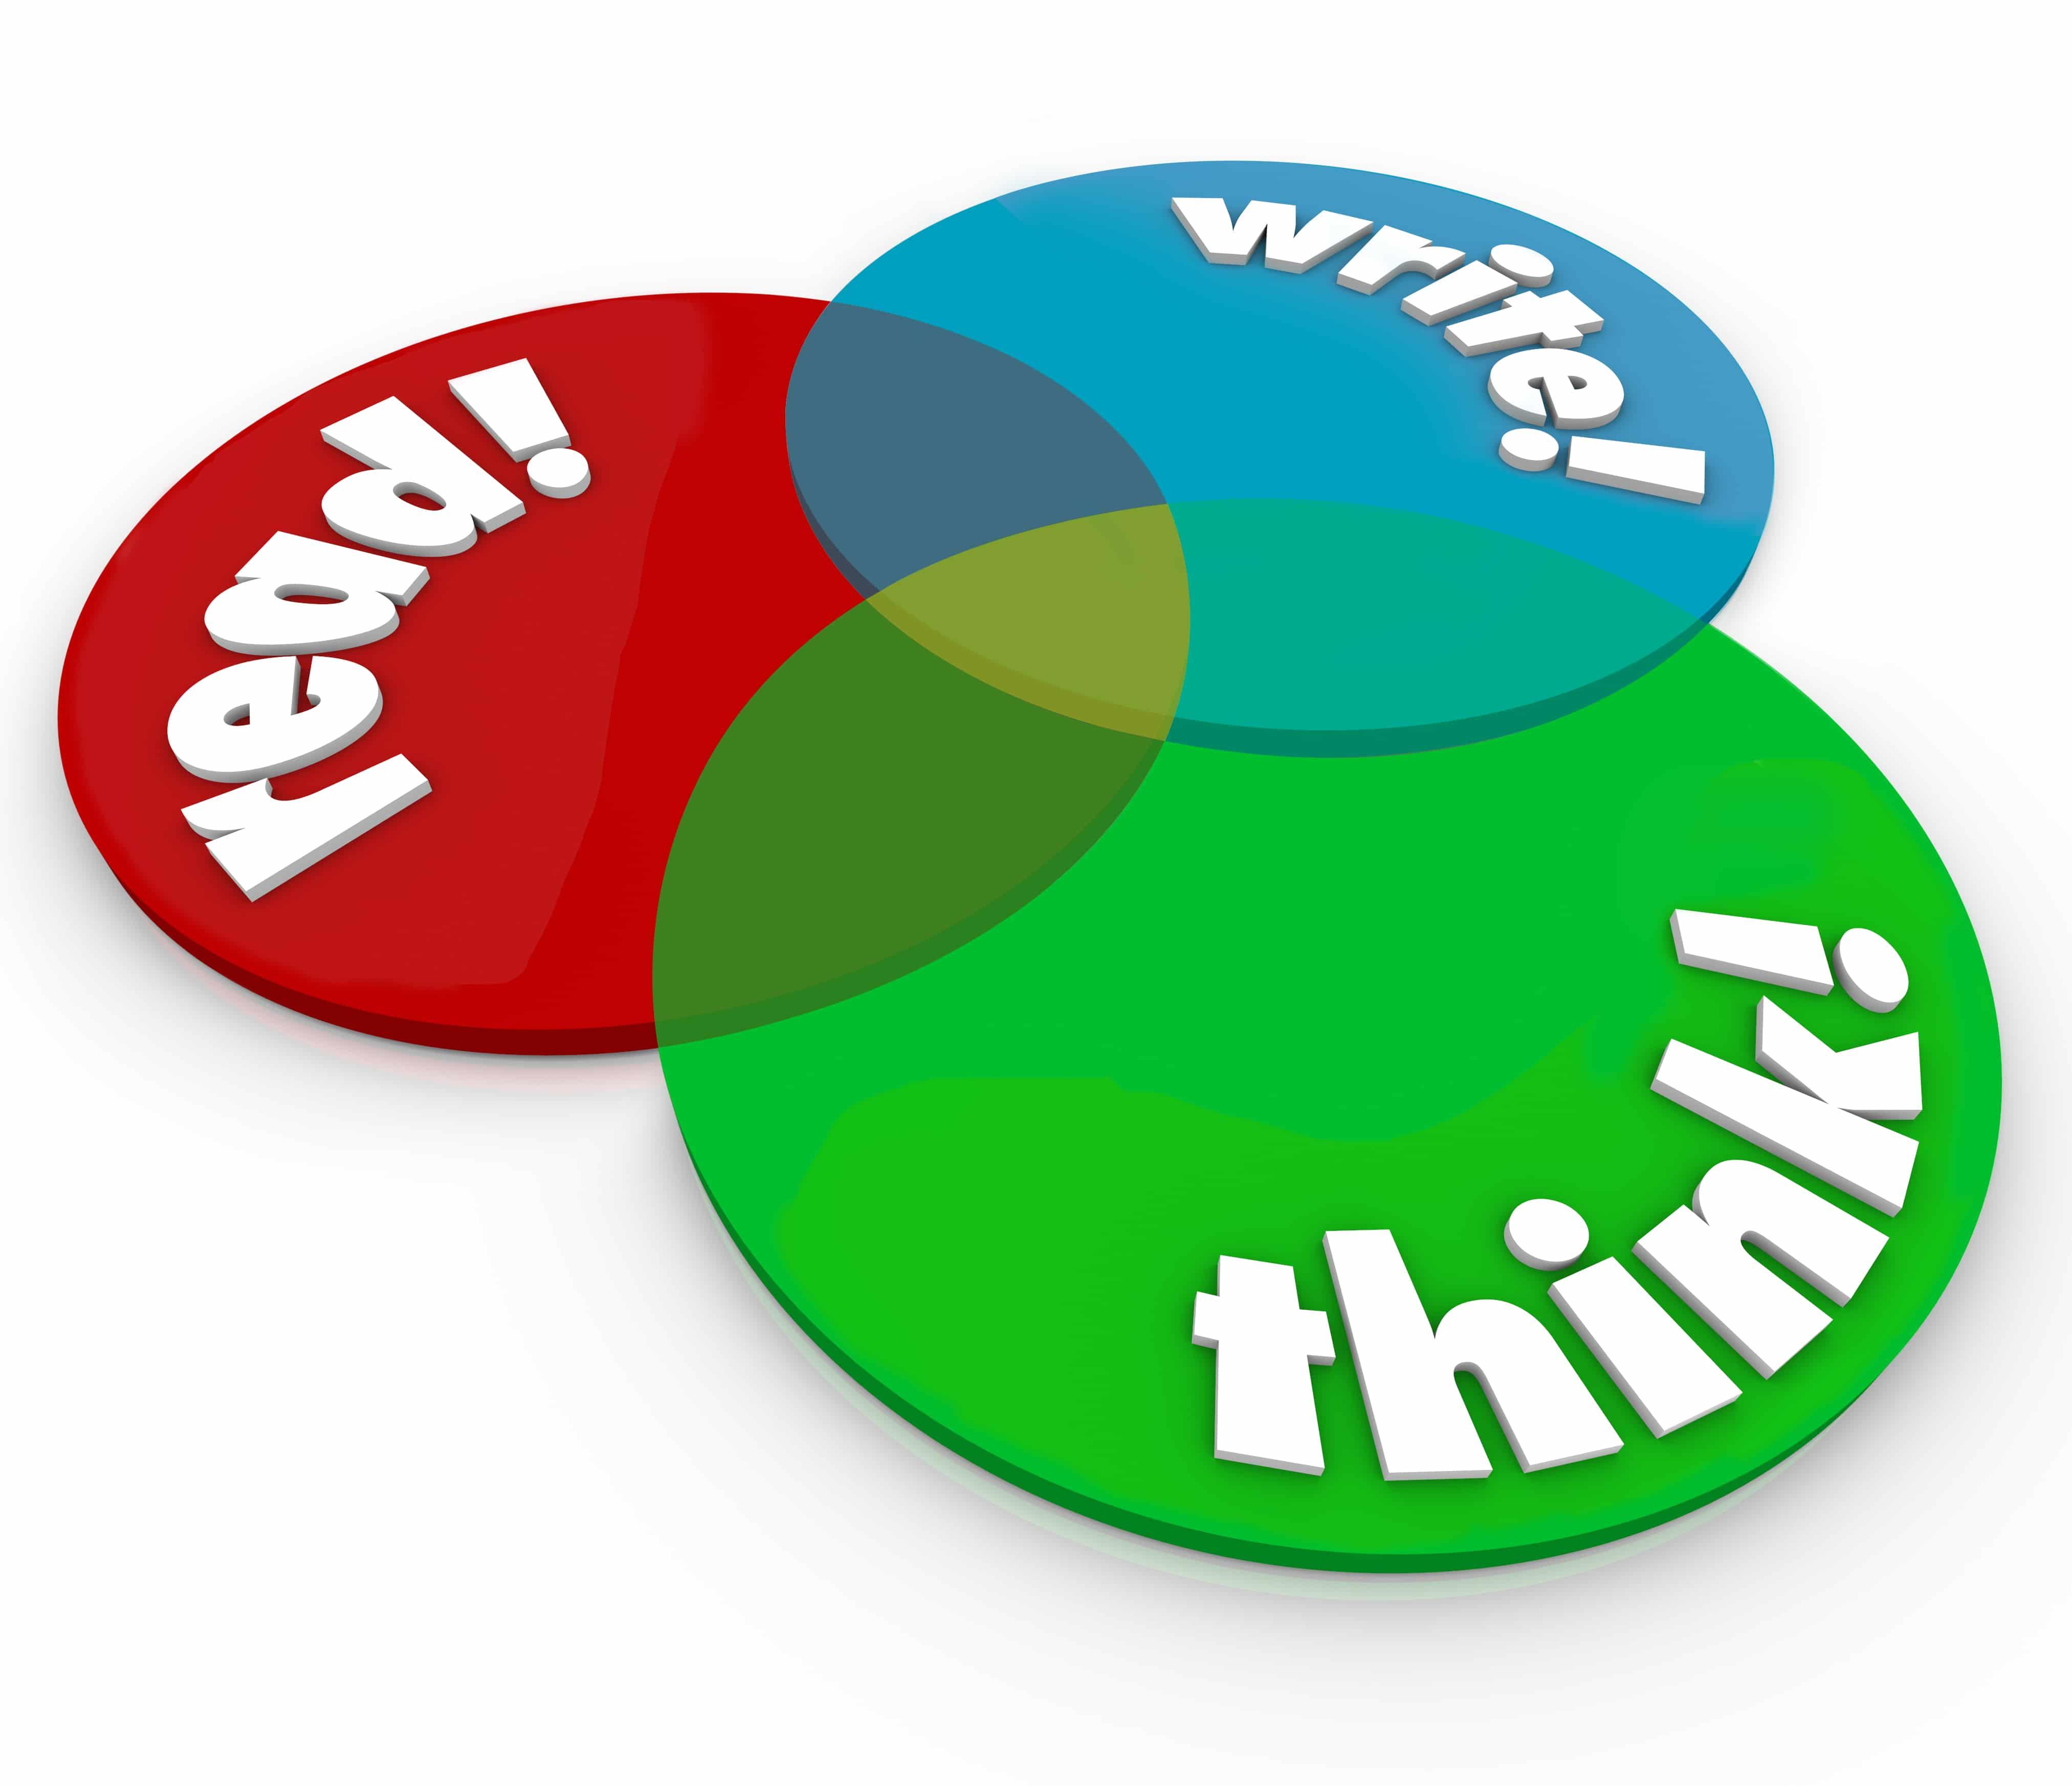 Teaching Strategies Fact Vs Opinion